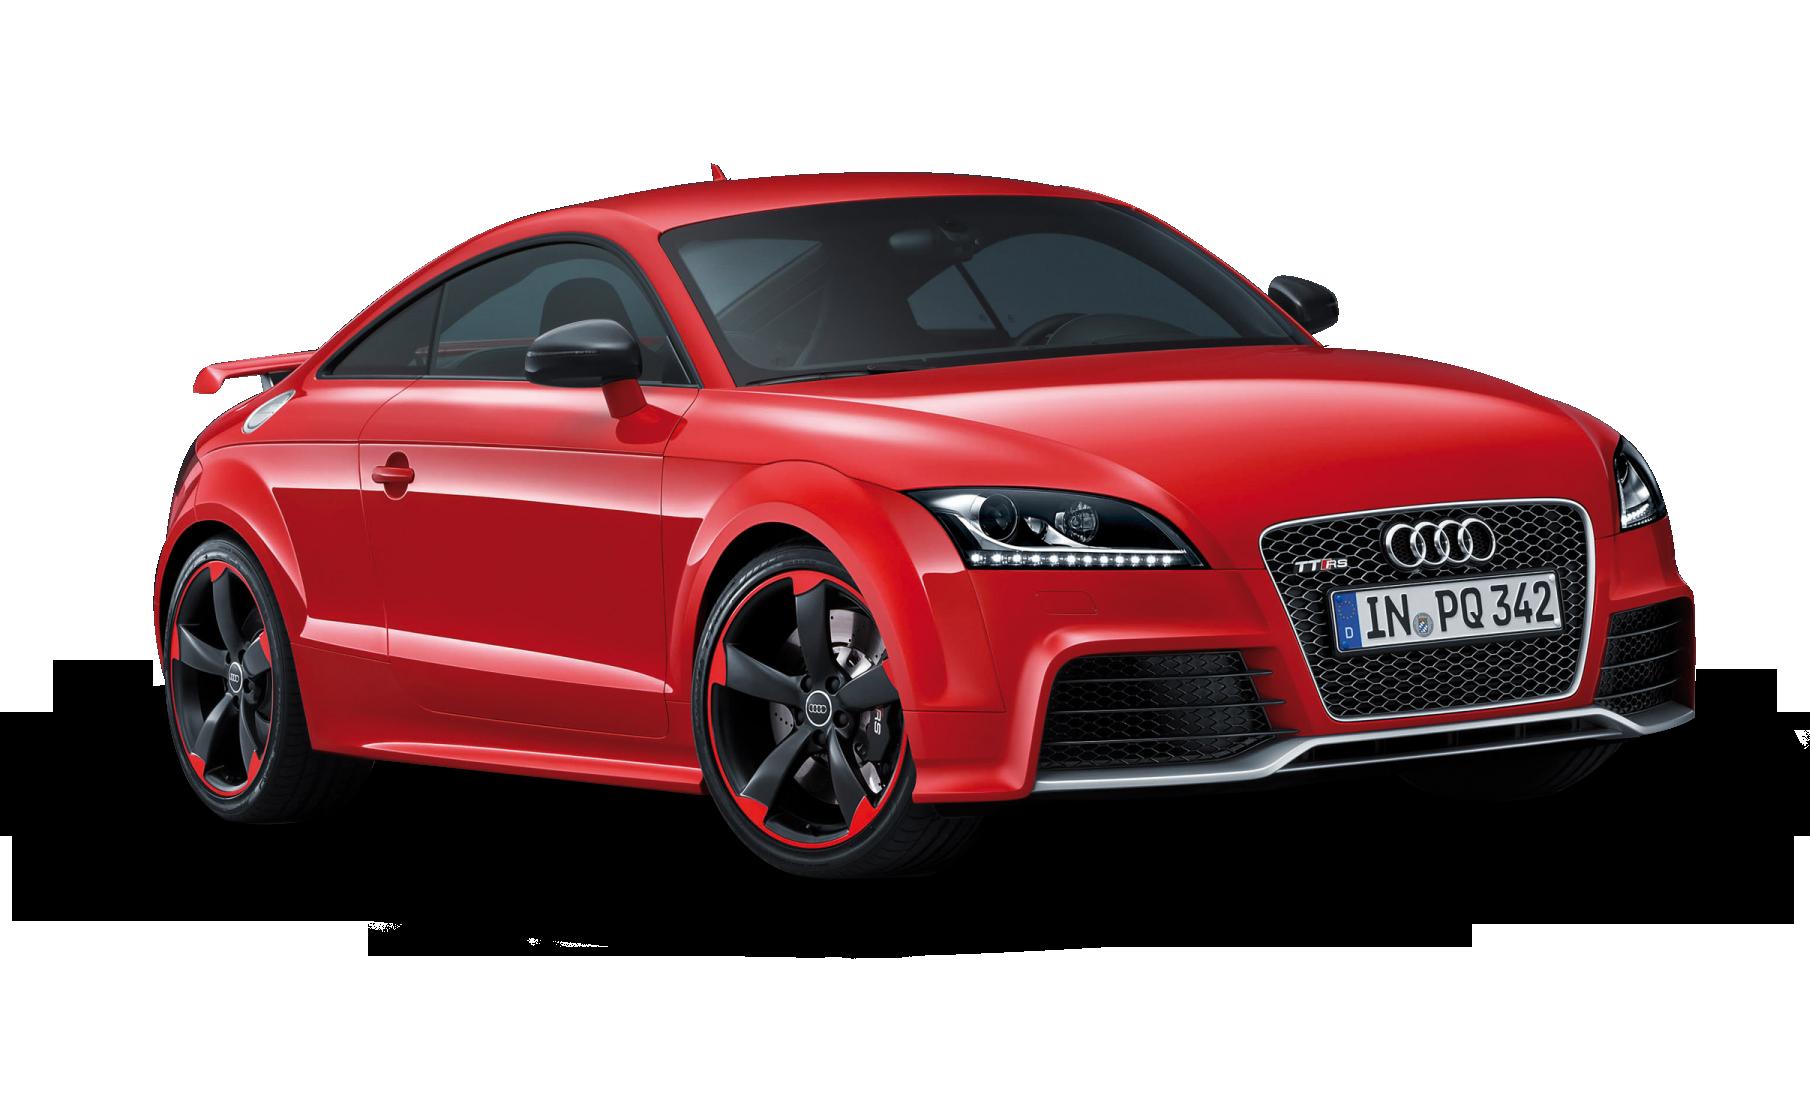 Red Audi Car PNG Image PurePNG Free Transparent CC PNG Image - Red audi